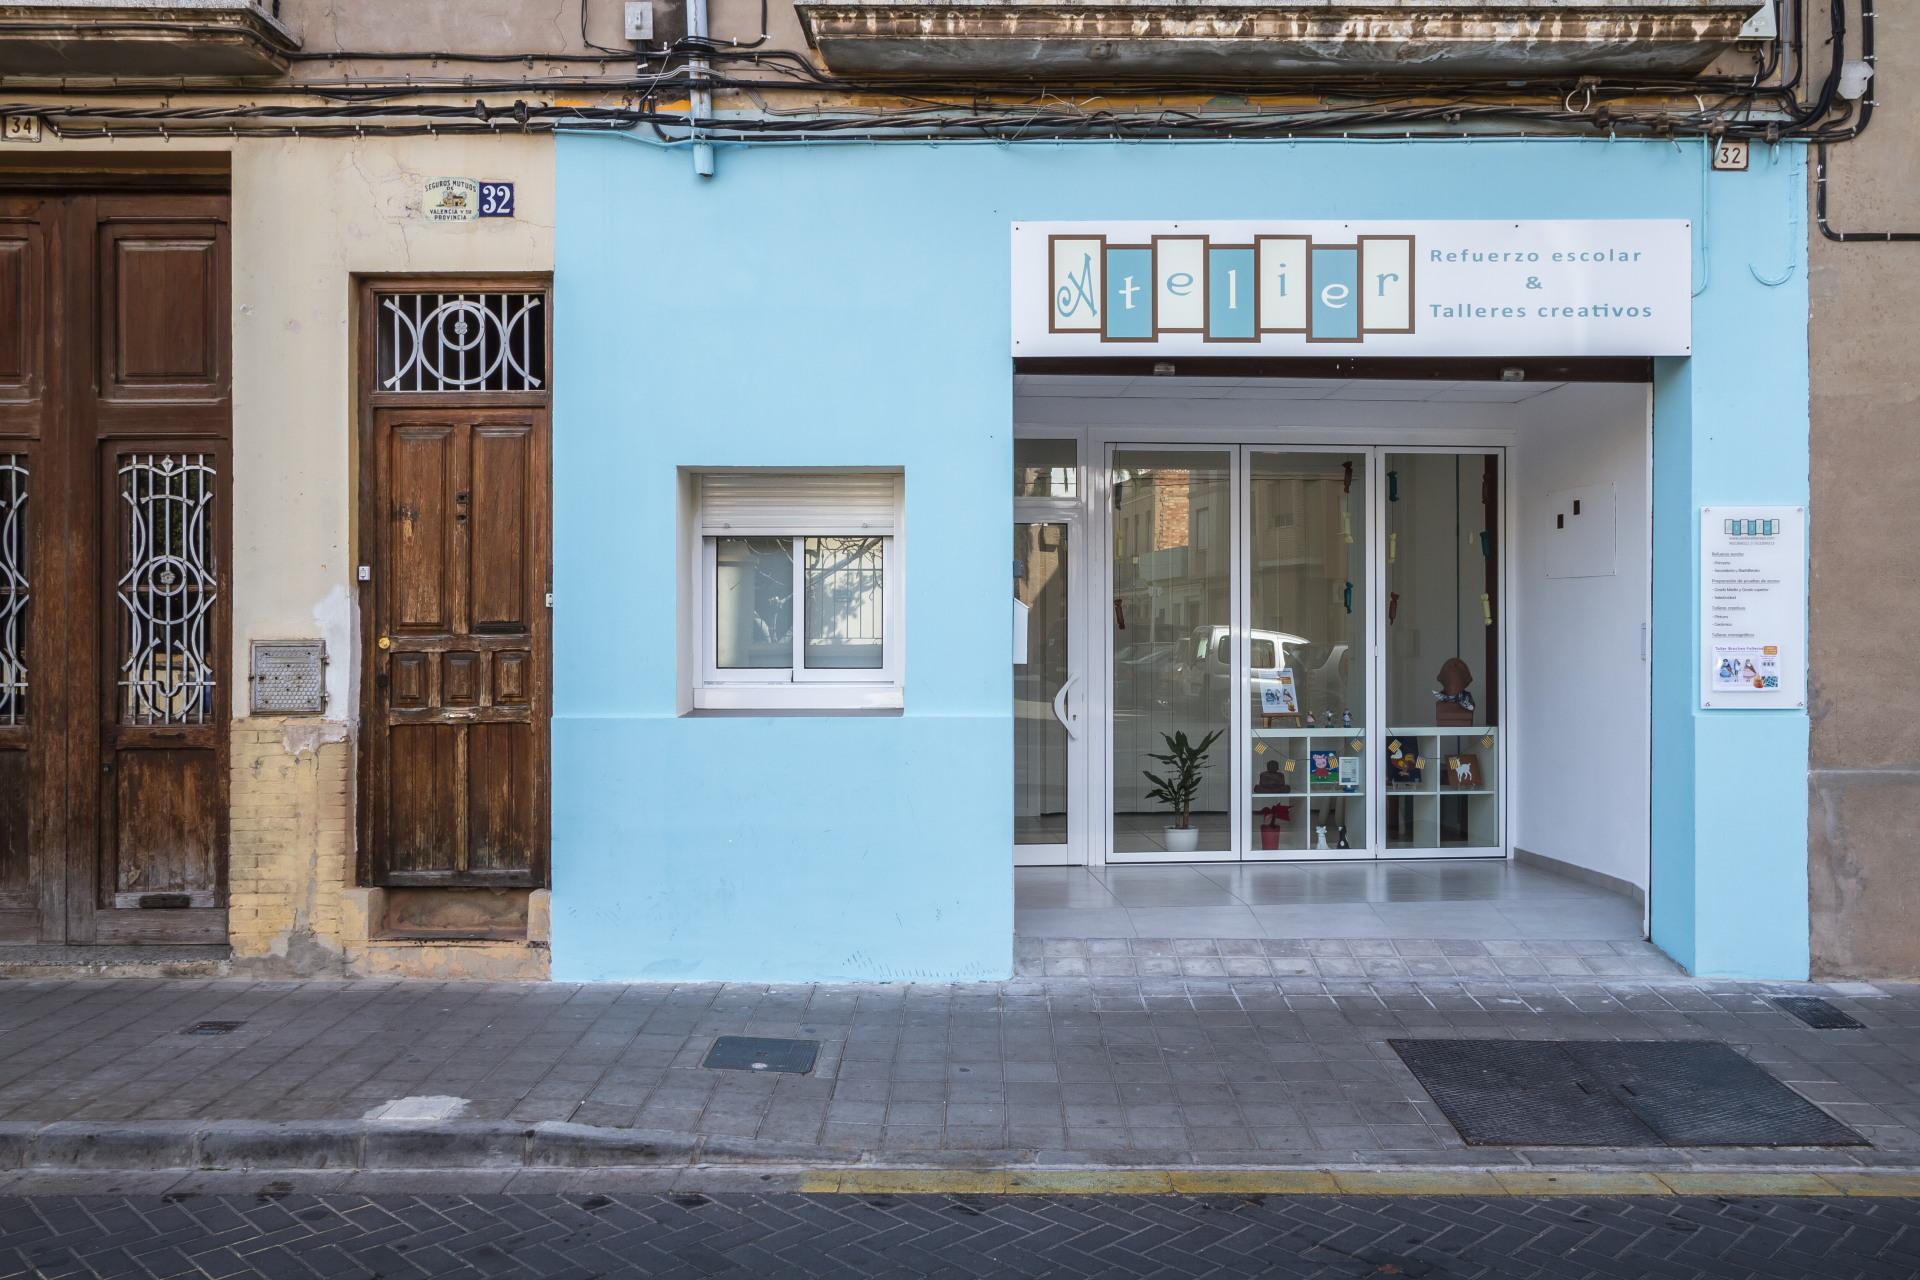 fotografia-arquitectura-valencia-german-cabo-viraje-atelier (1)